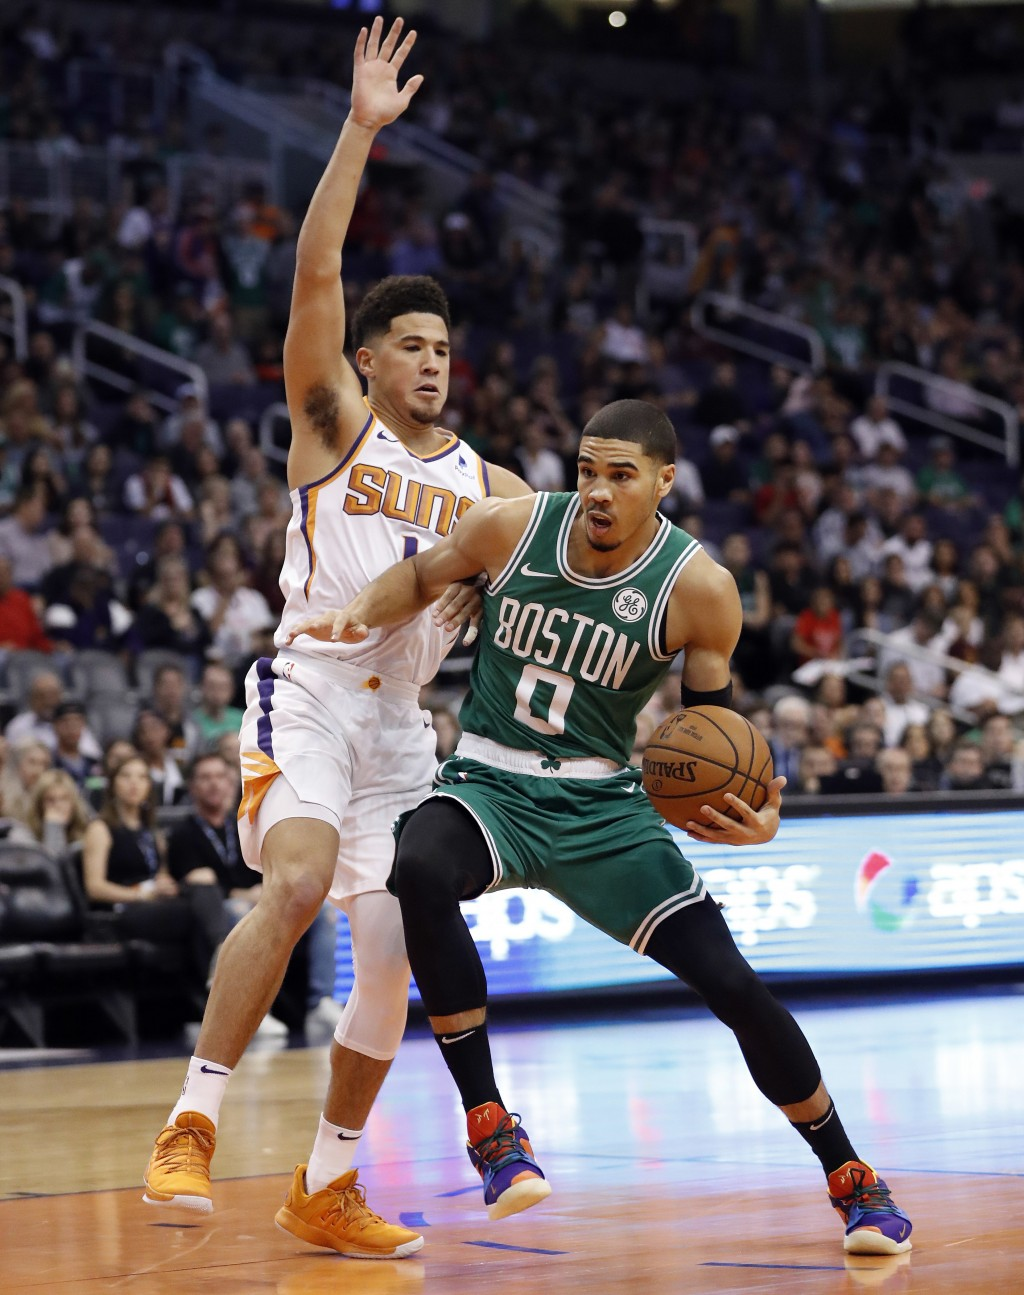 Boston Celtics forward Jayson Tatum (0) drives past Phoenix Suns guard Devin Booker (1) during the first half of an NBA basketball game Thursday, Nov.